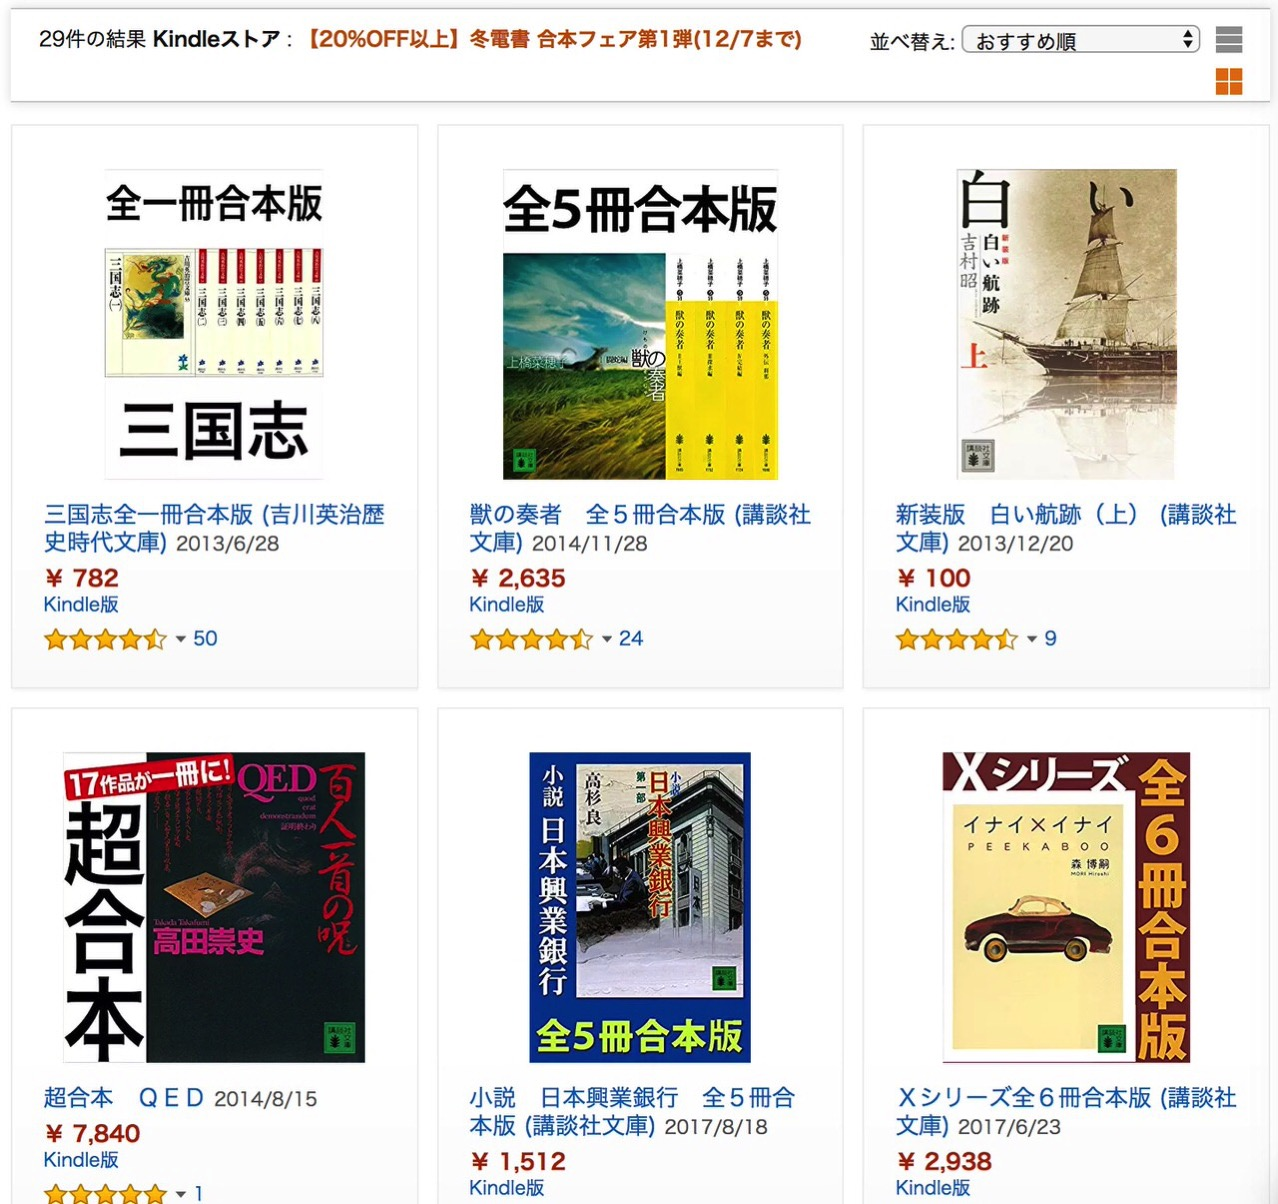 【Kindleセール】20%OFF以上「冬電書 合本フェア第1弾」〜三国志、亡国のイージスなど(〜12/7)